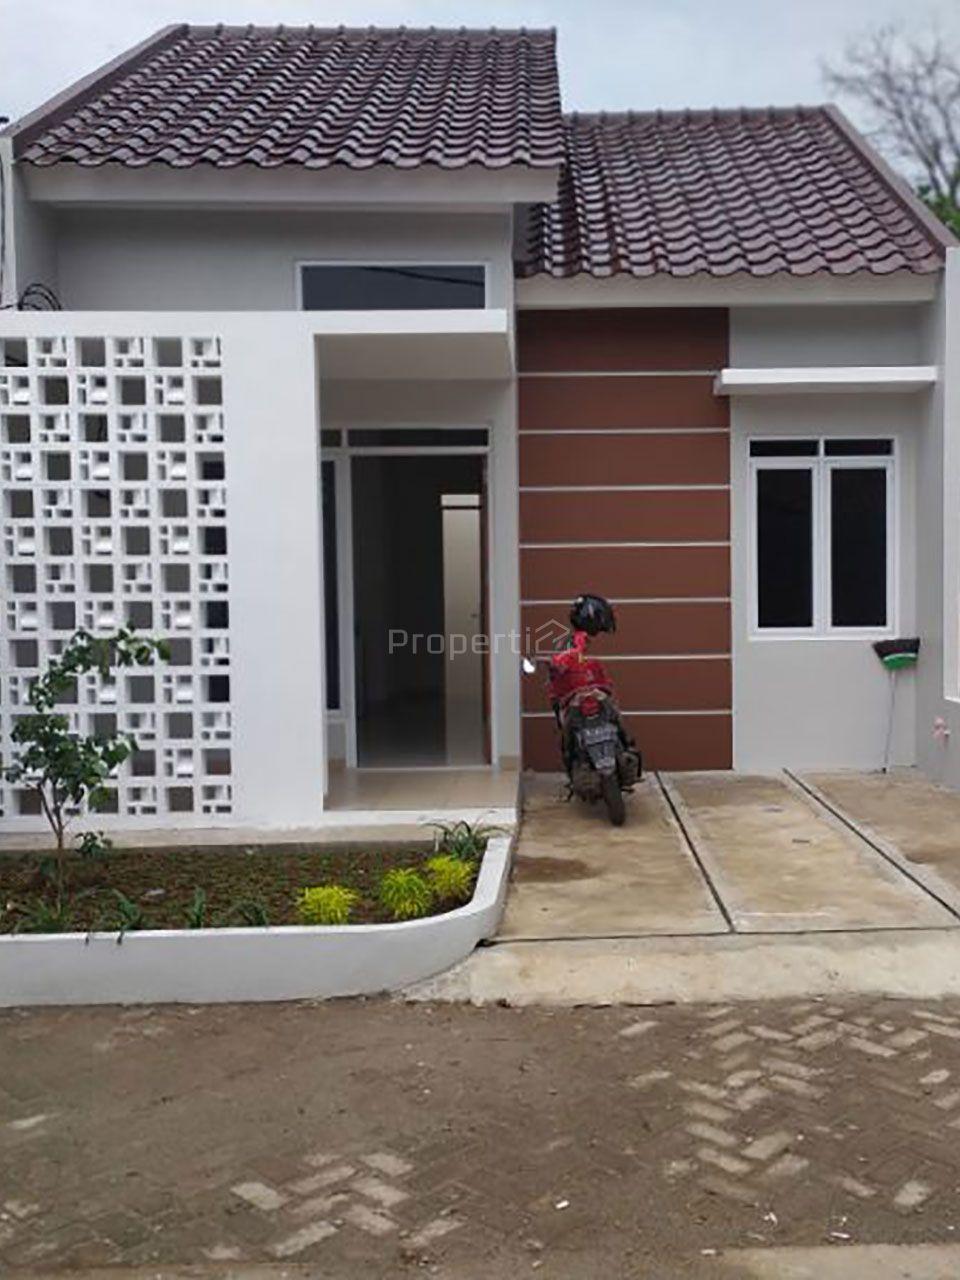 New House in Exclusive Cluster in Jatiasih, Jawa Barat